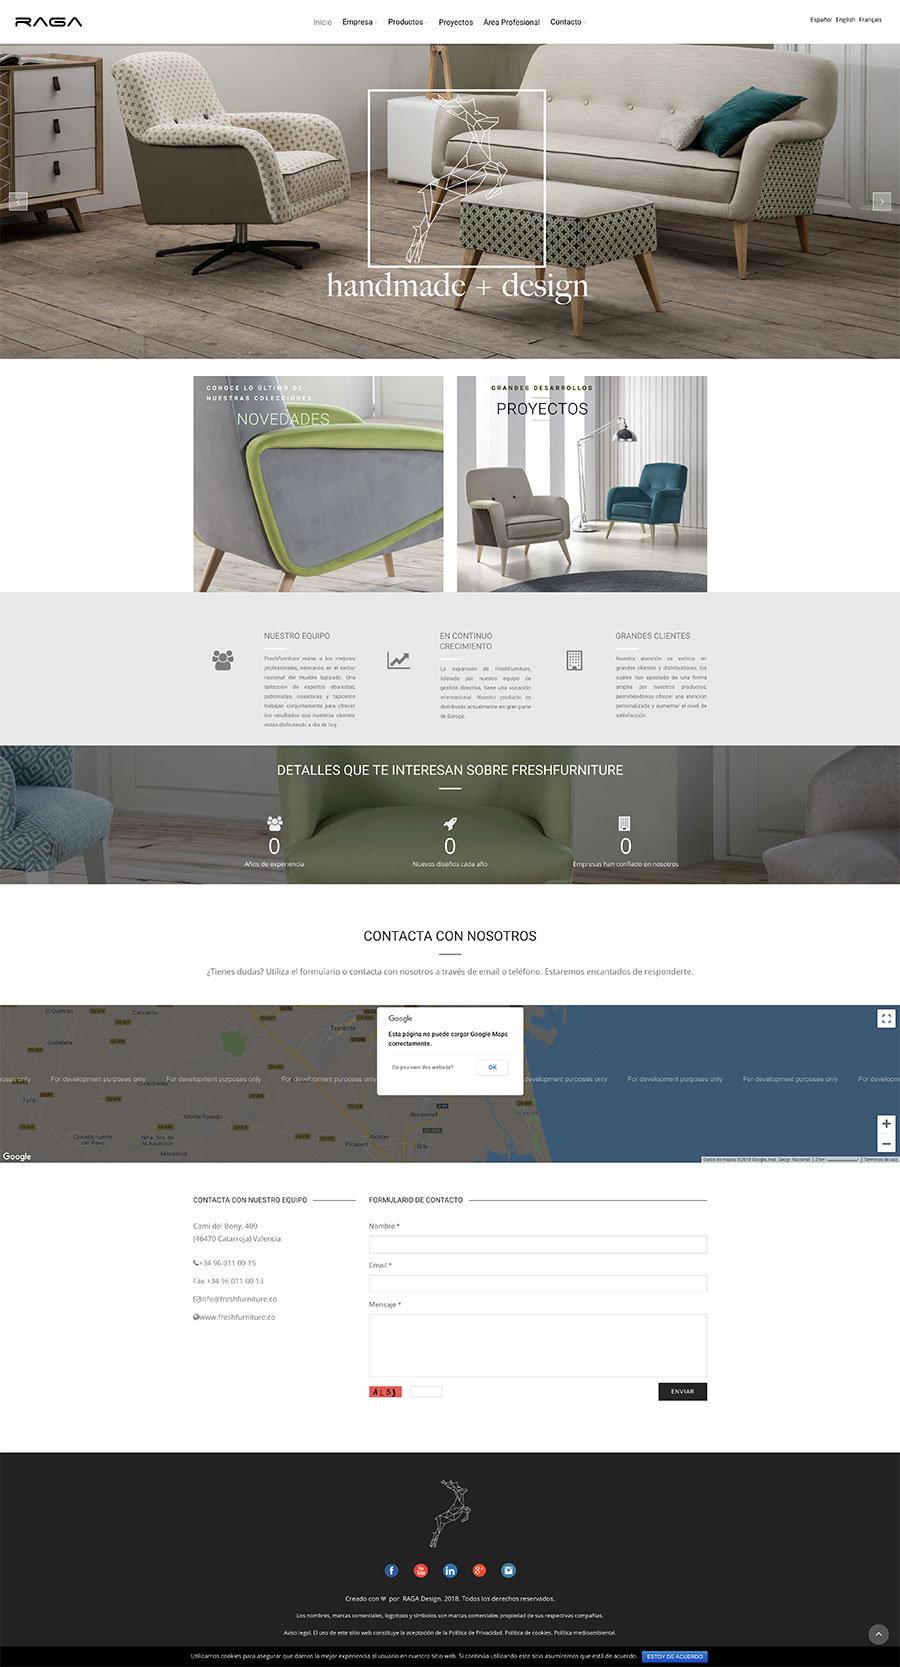 Wellaggio-diseño-web-valencia-freshfurniture-co-2018-08-19-13_41_30